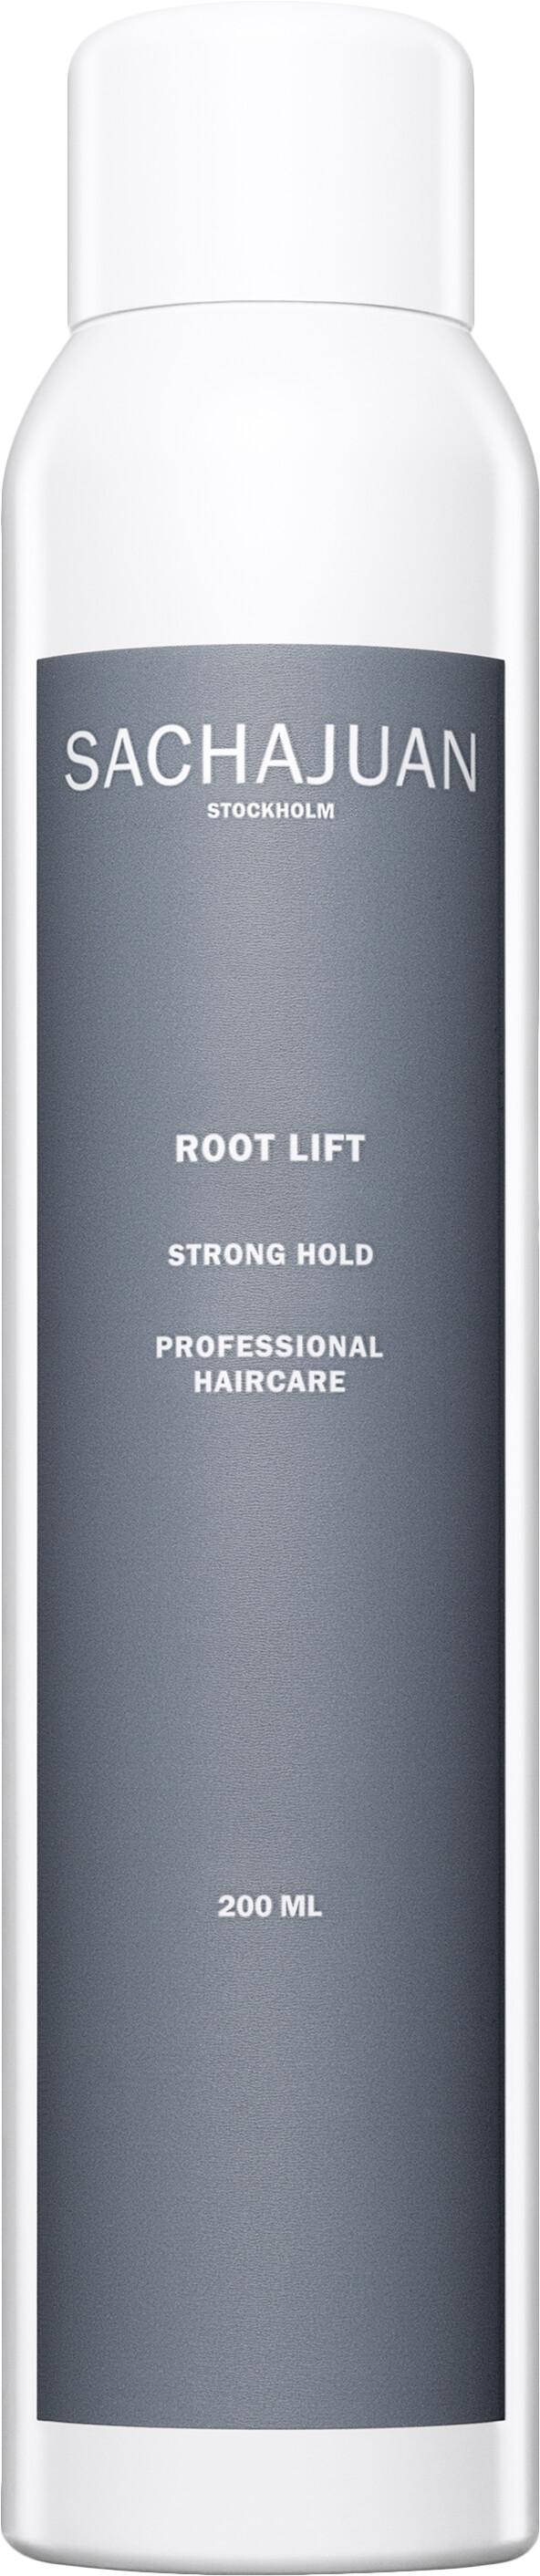 sachajuan root lift